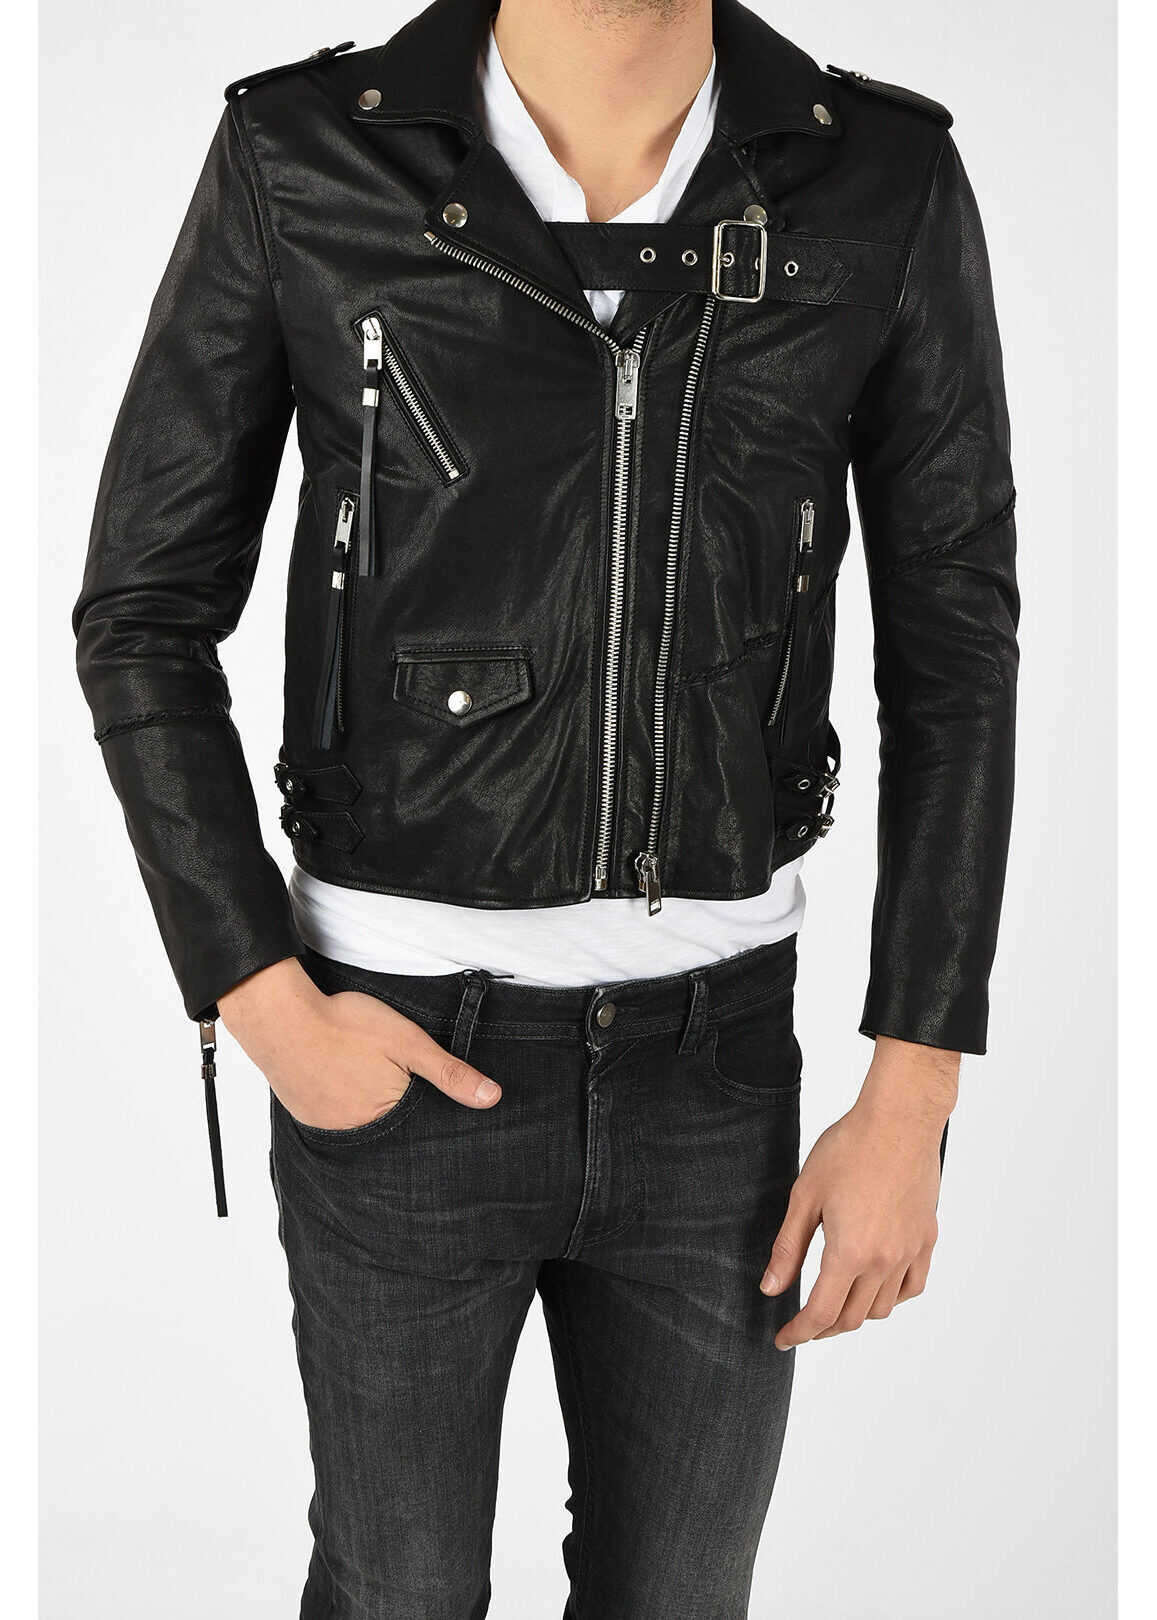 Diesel Leather Studded SE-LENE Jacket BLACK imagine